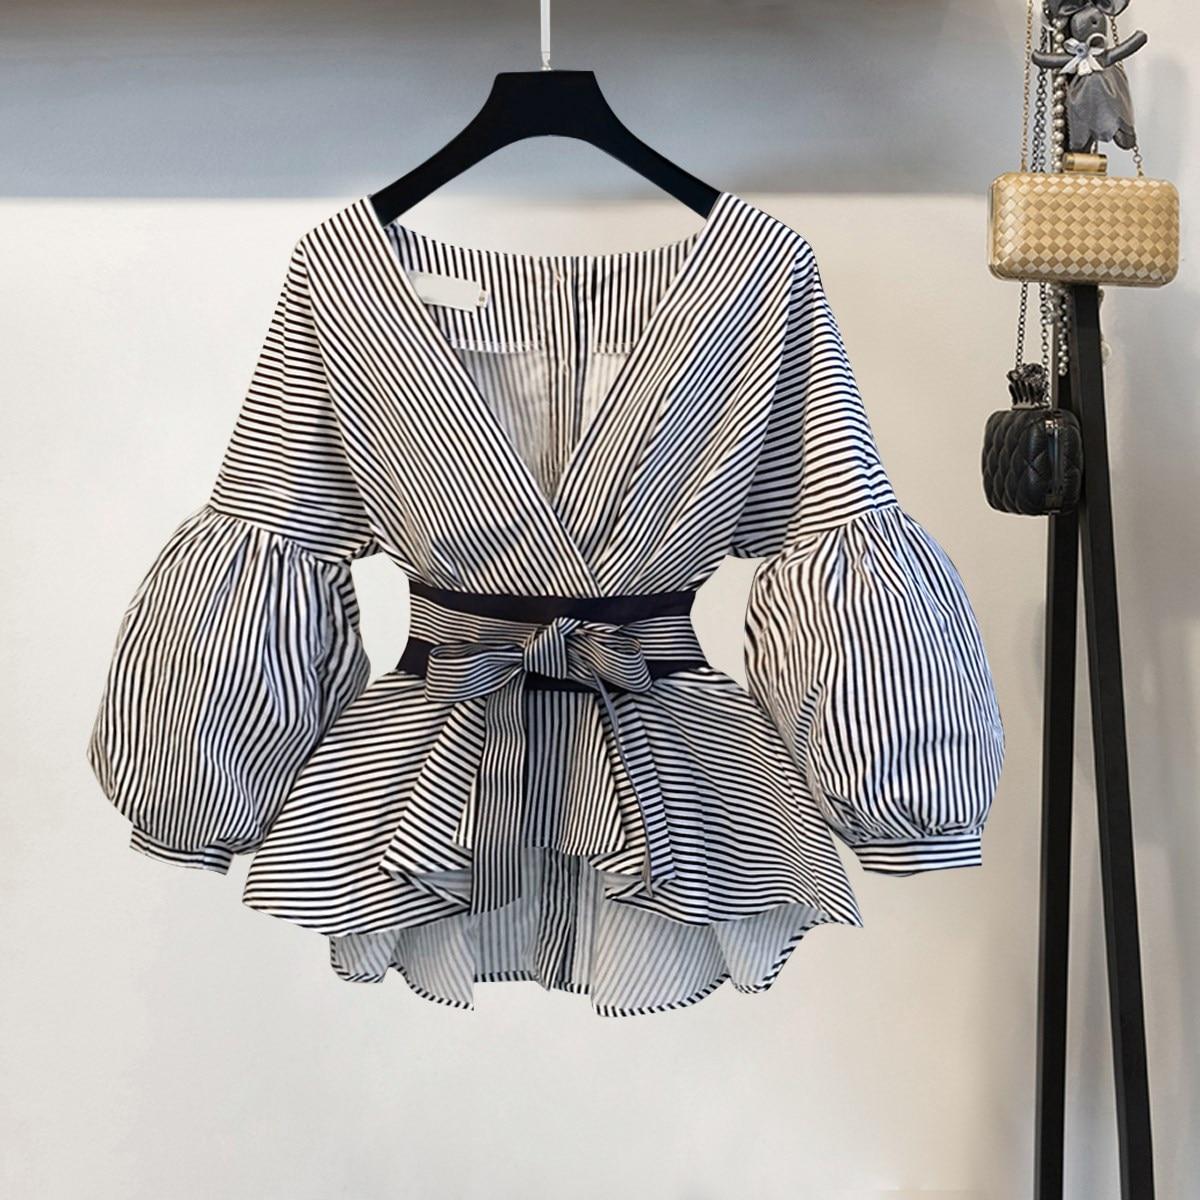 Lantern Sleeve Blouse Shirt Women 2018 Fashion Korean Style Summer Bow V-neck Striped Shirt Elegant Ladies Tops Female Clothing